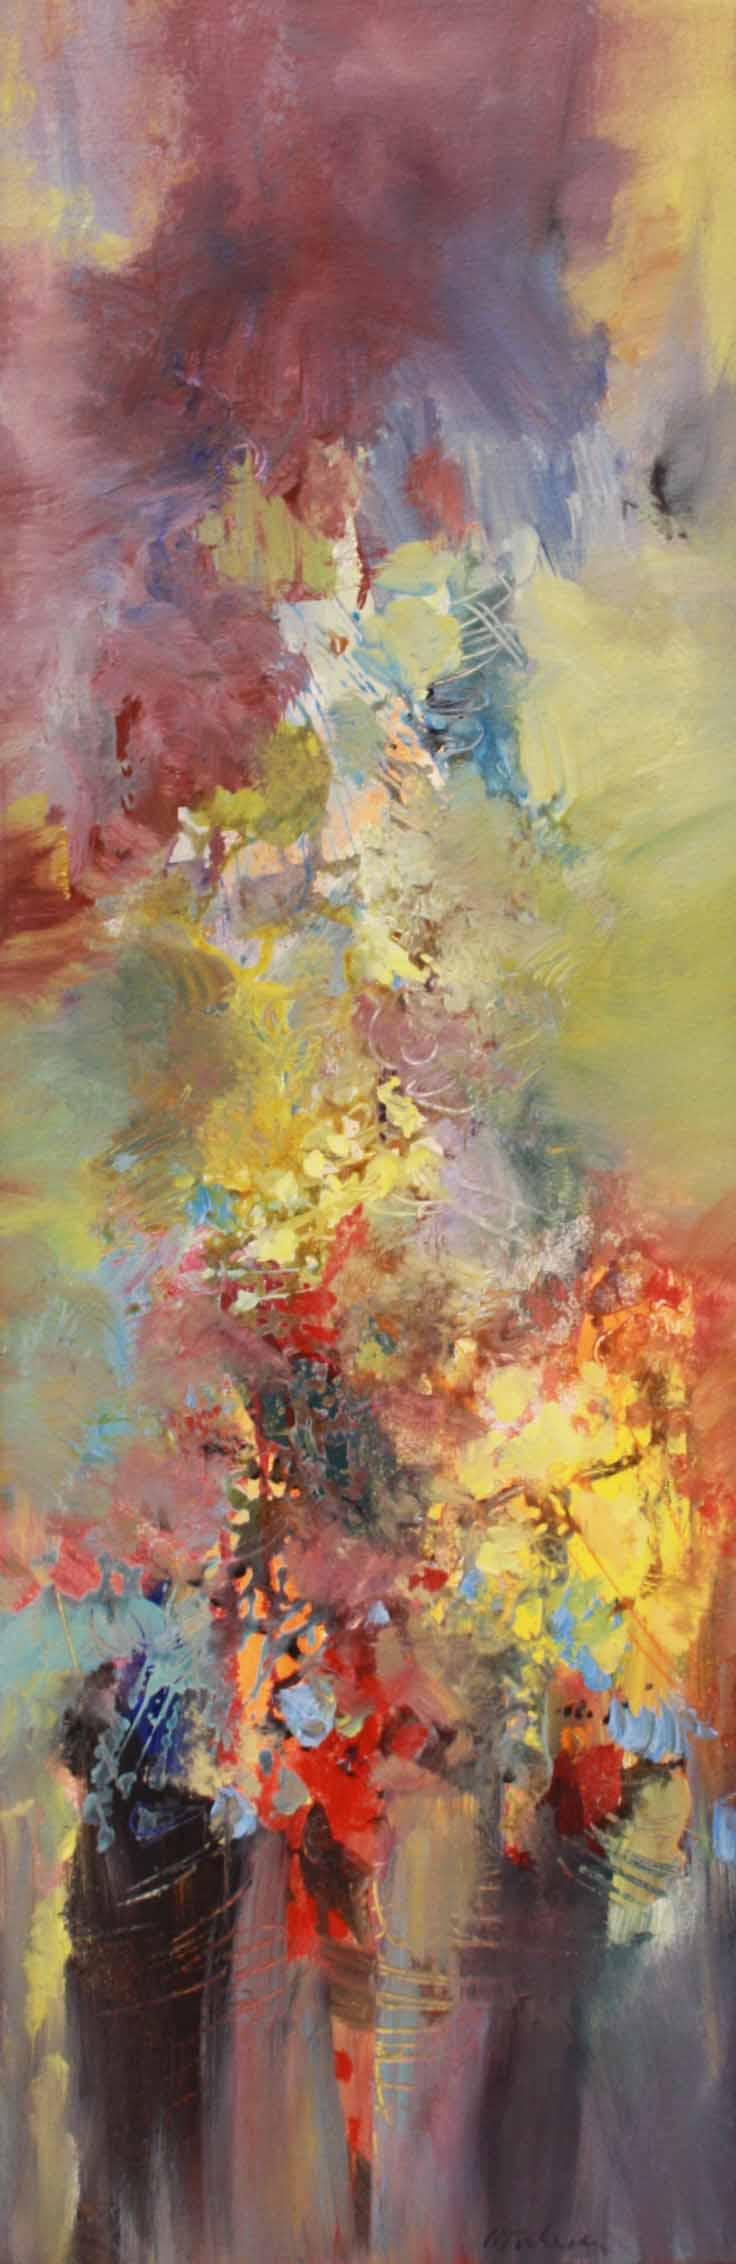 Johannes Brahms -PianoQuartet Op.25 #4 42x14 Acrylic on Canvas SOLD